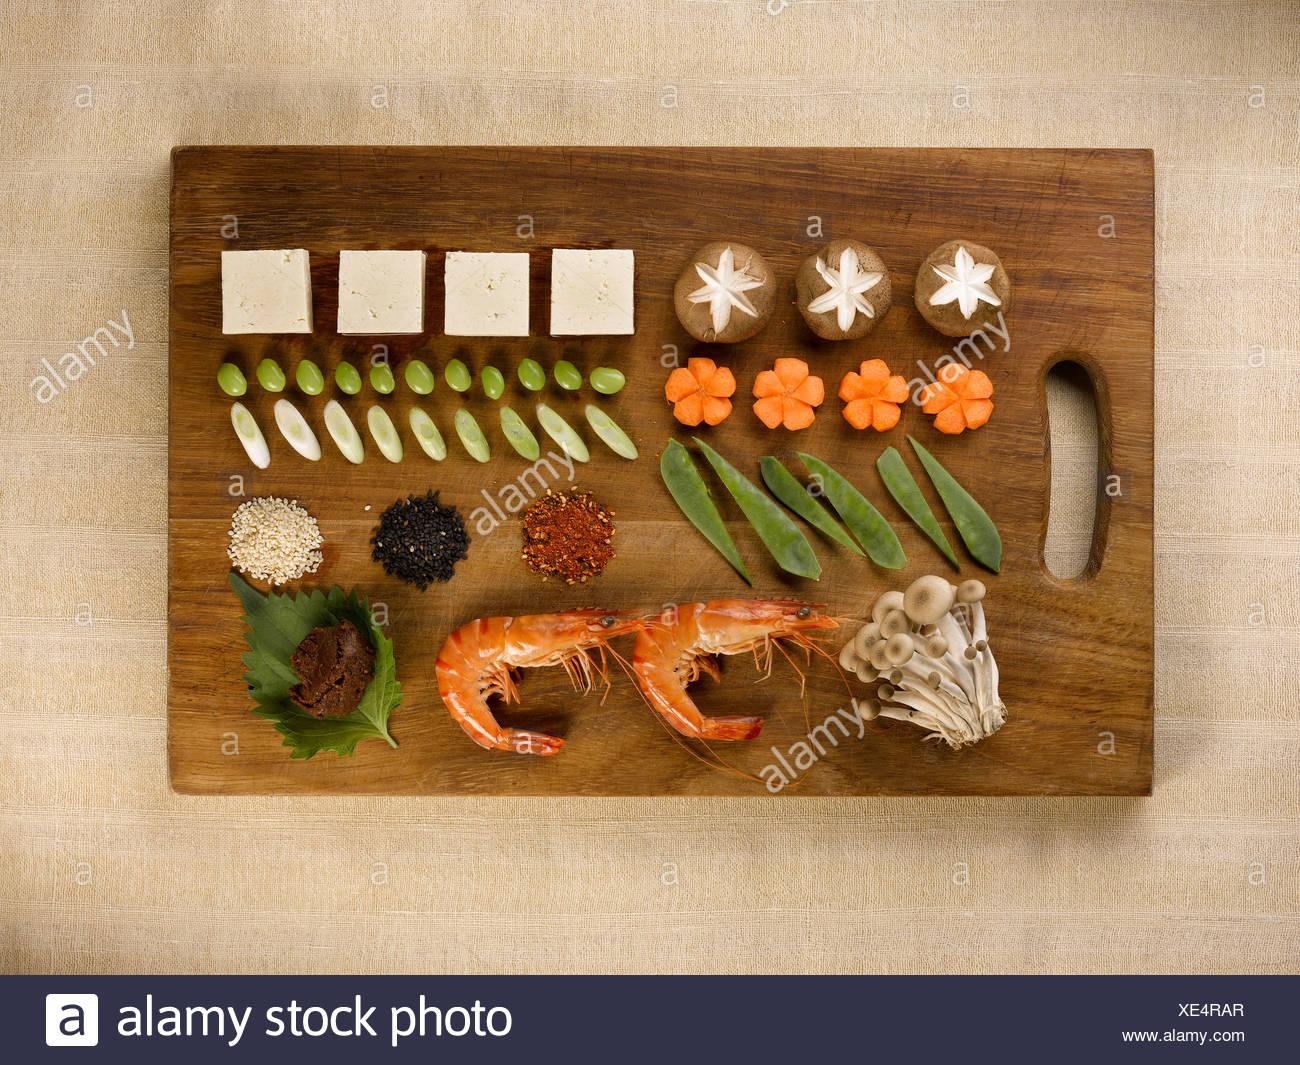 Tray of neatly organized food - Stock Image